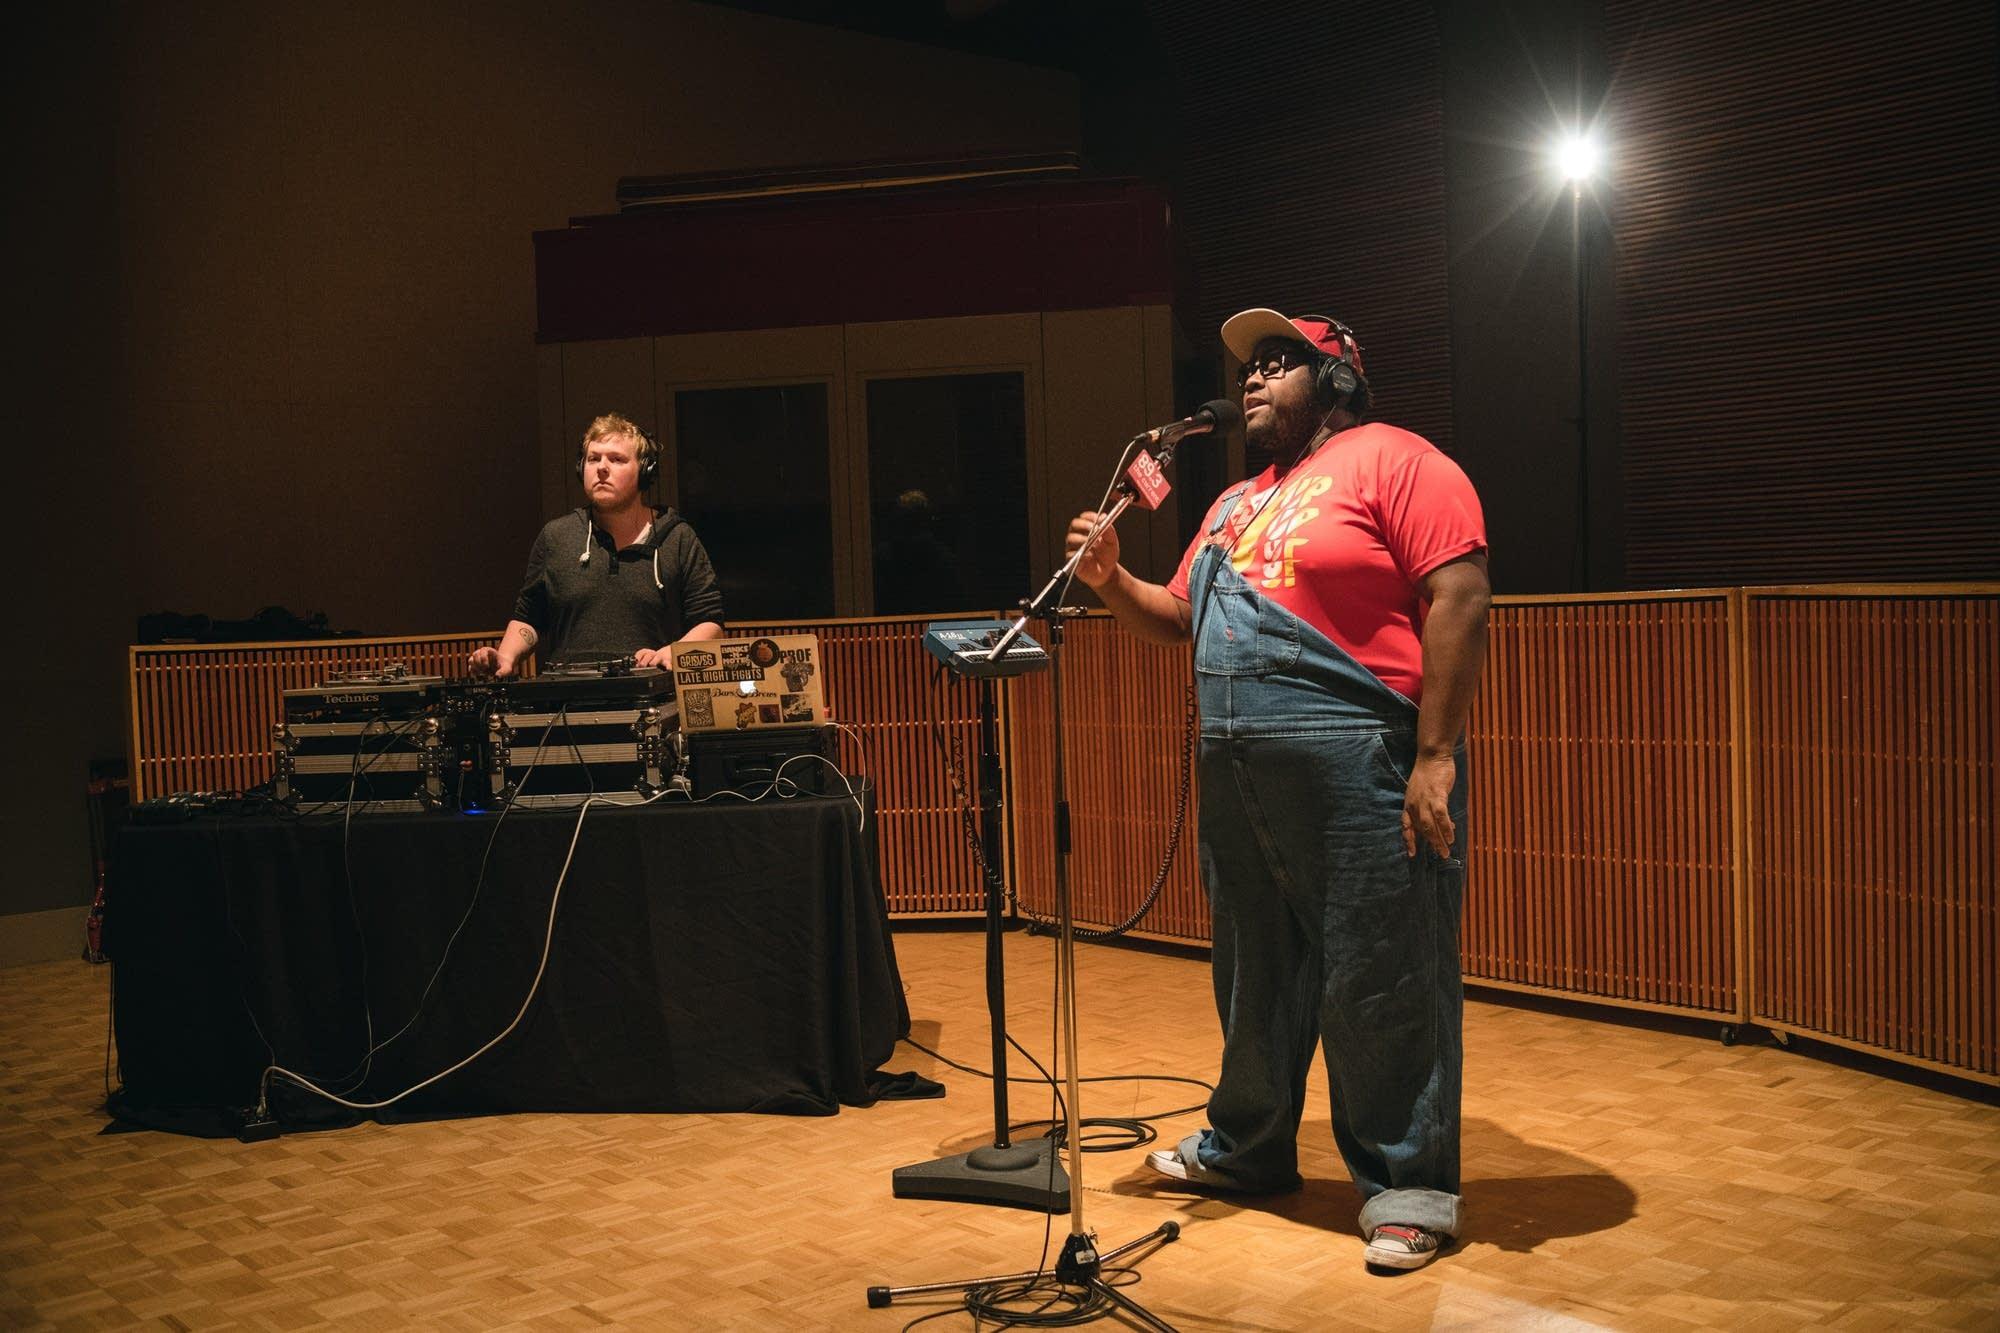 Nur-D performs in The Current studio.